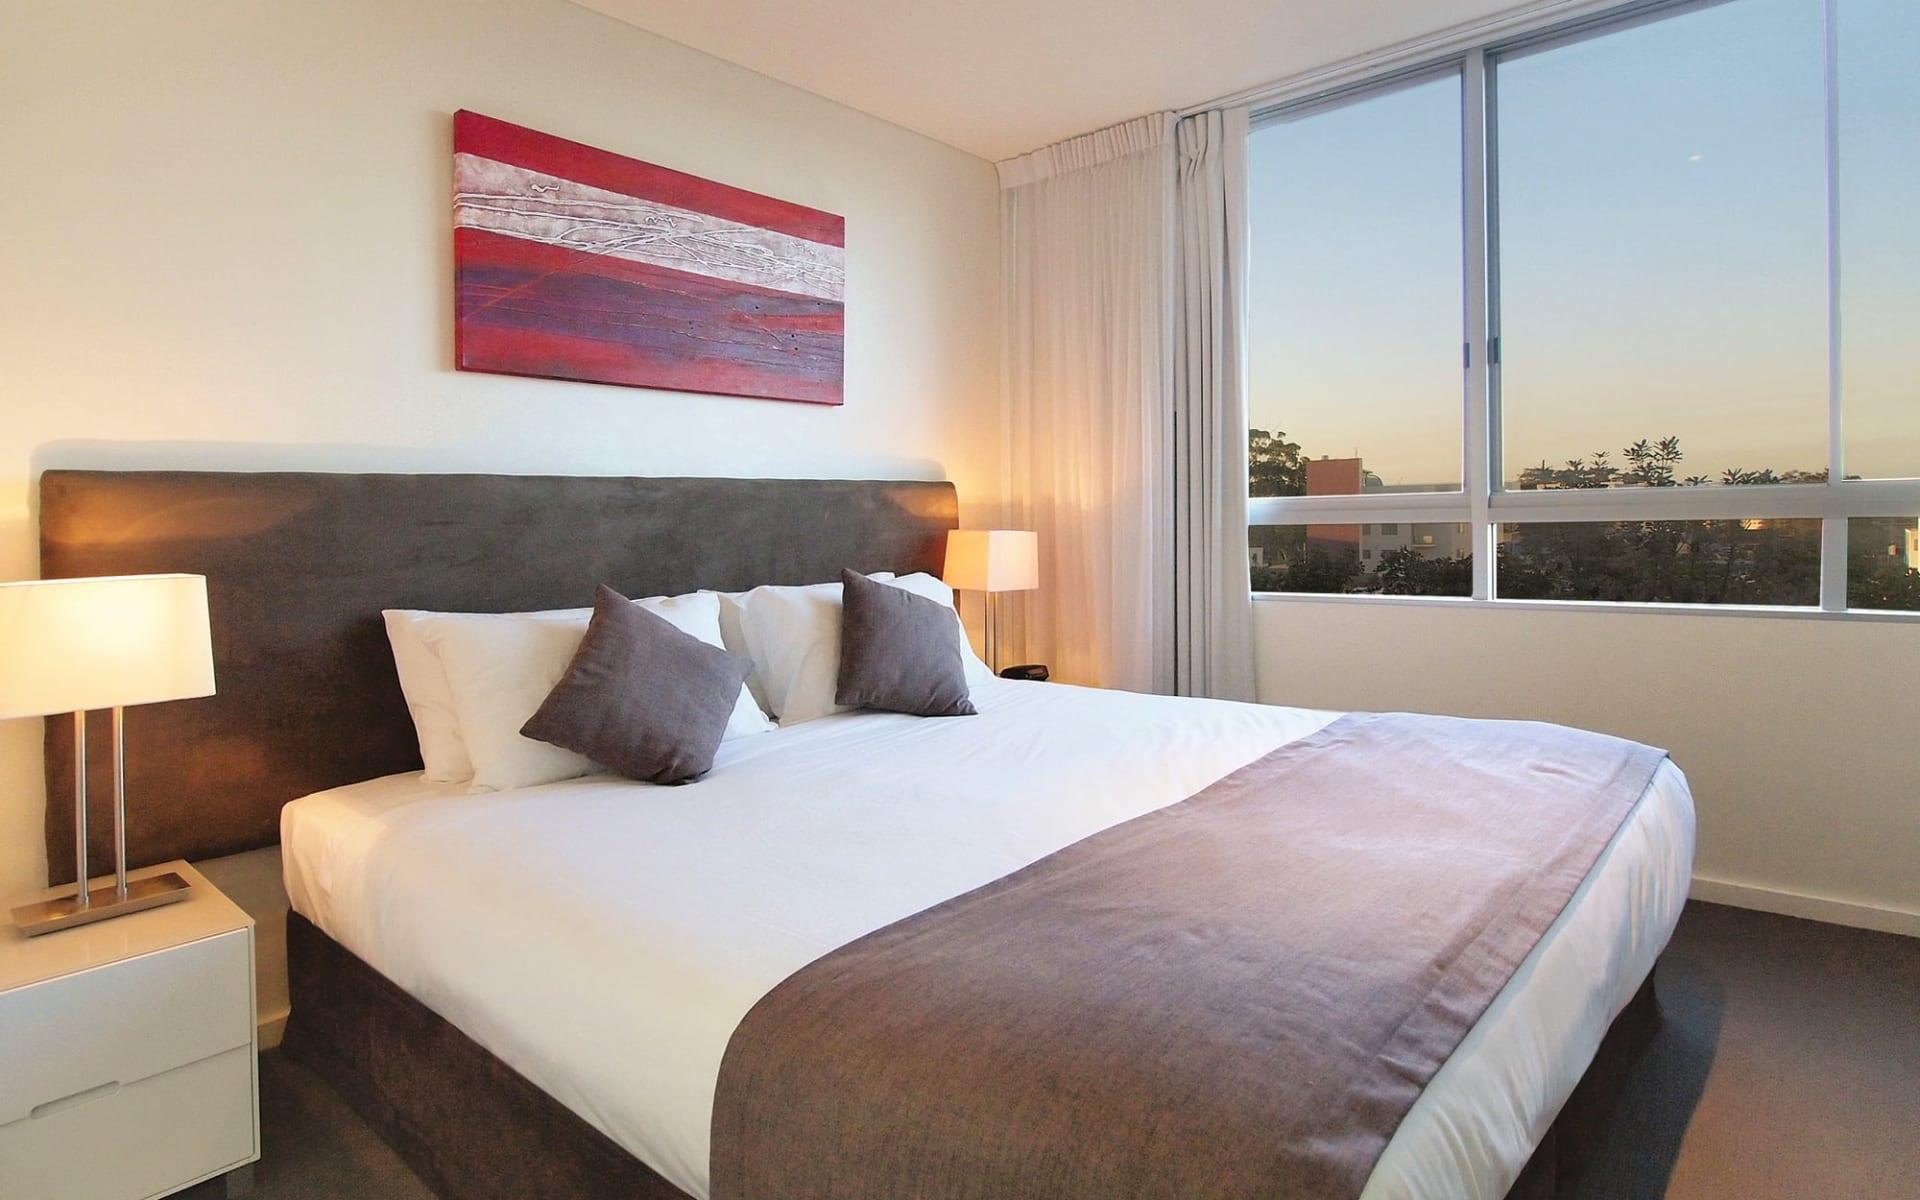 Oaks Lure in Port Stephens:  Oaks Lure - 1-Bedroom Apartment